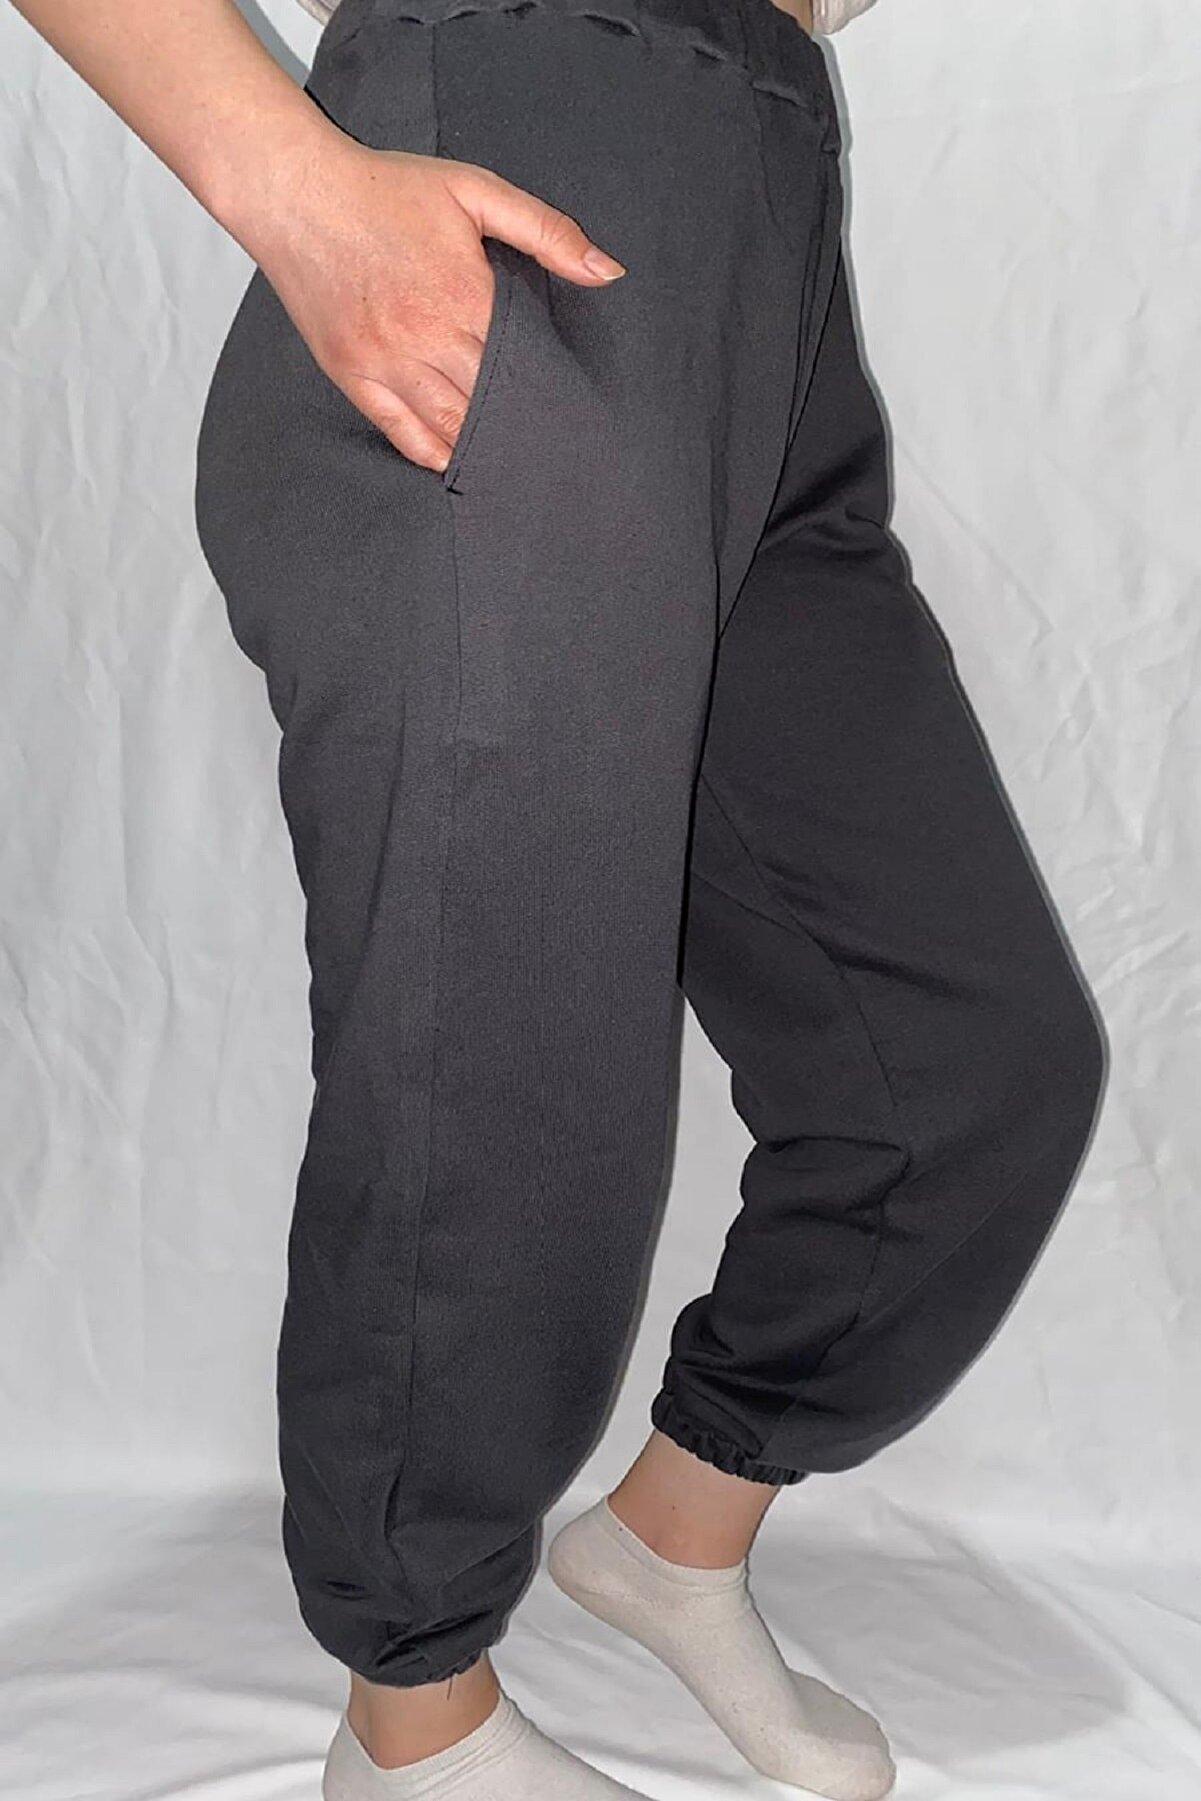 Modoo Tekstil Unisex Antrasit Paçası Lastikli Eşofman Altı